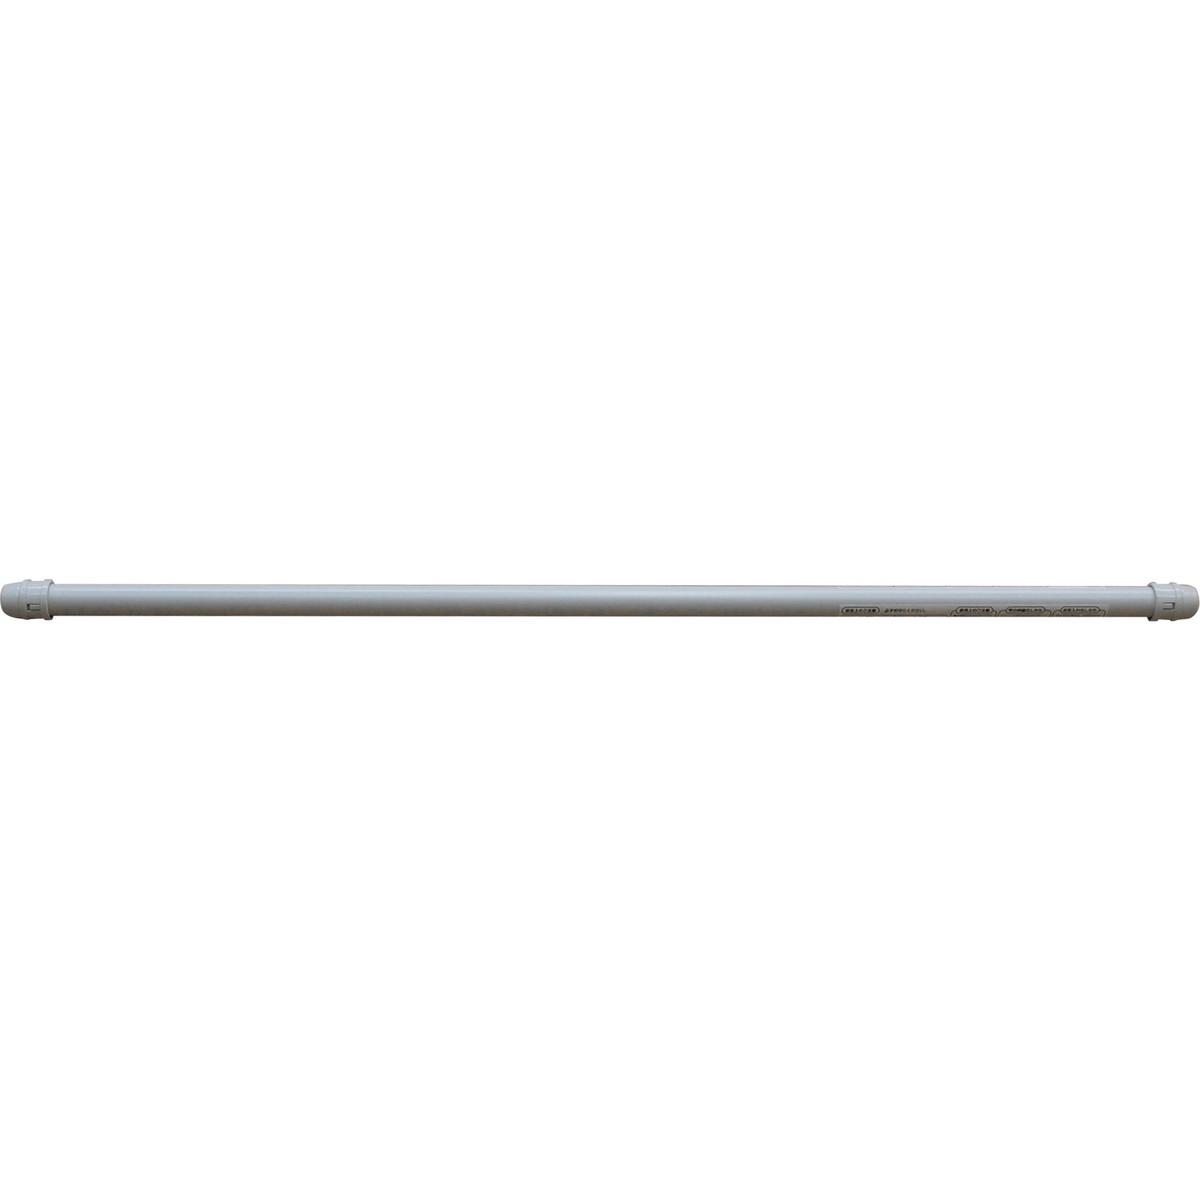 【AUX/オークス】フレクリーン 室内物干し用 伸縮竿(956mm〜1709mm)